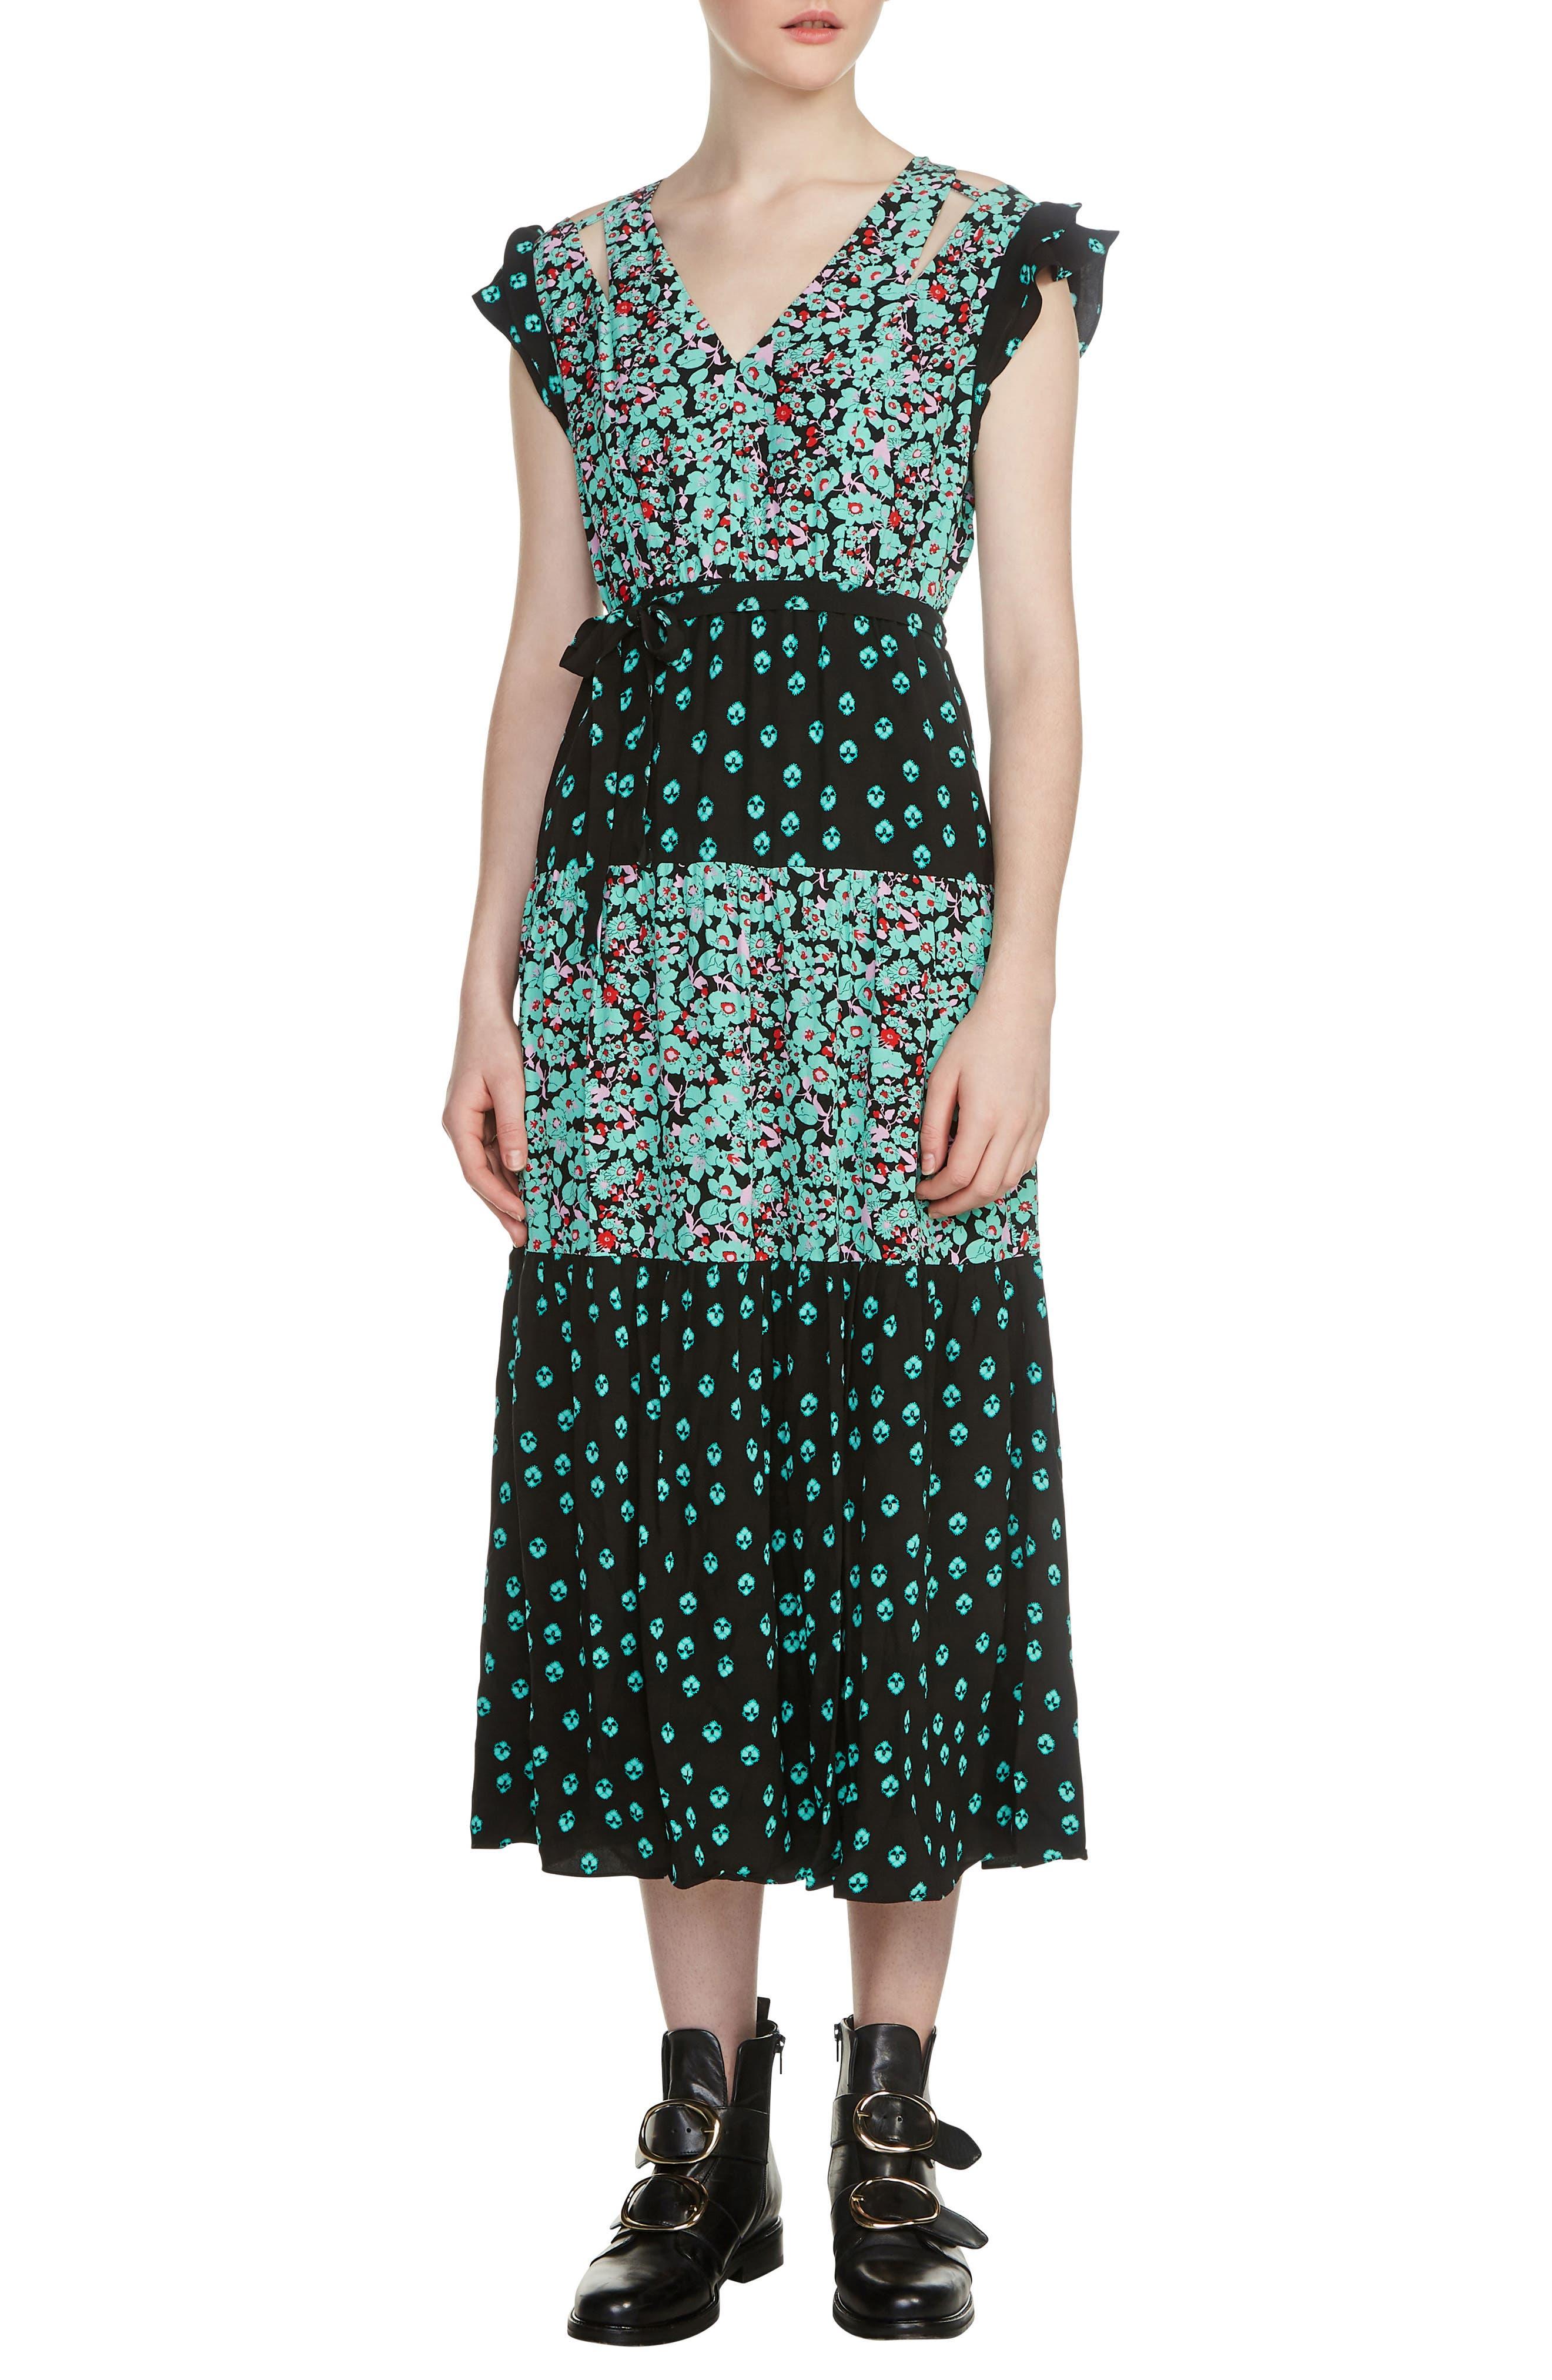 Renoli Mixed Print Midi Dress,                             Main thumbnail 1, color,                             Printed